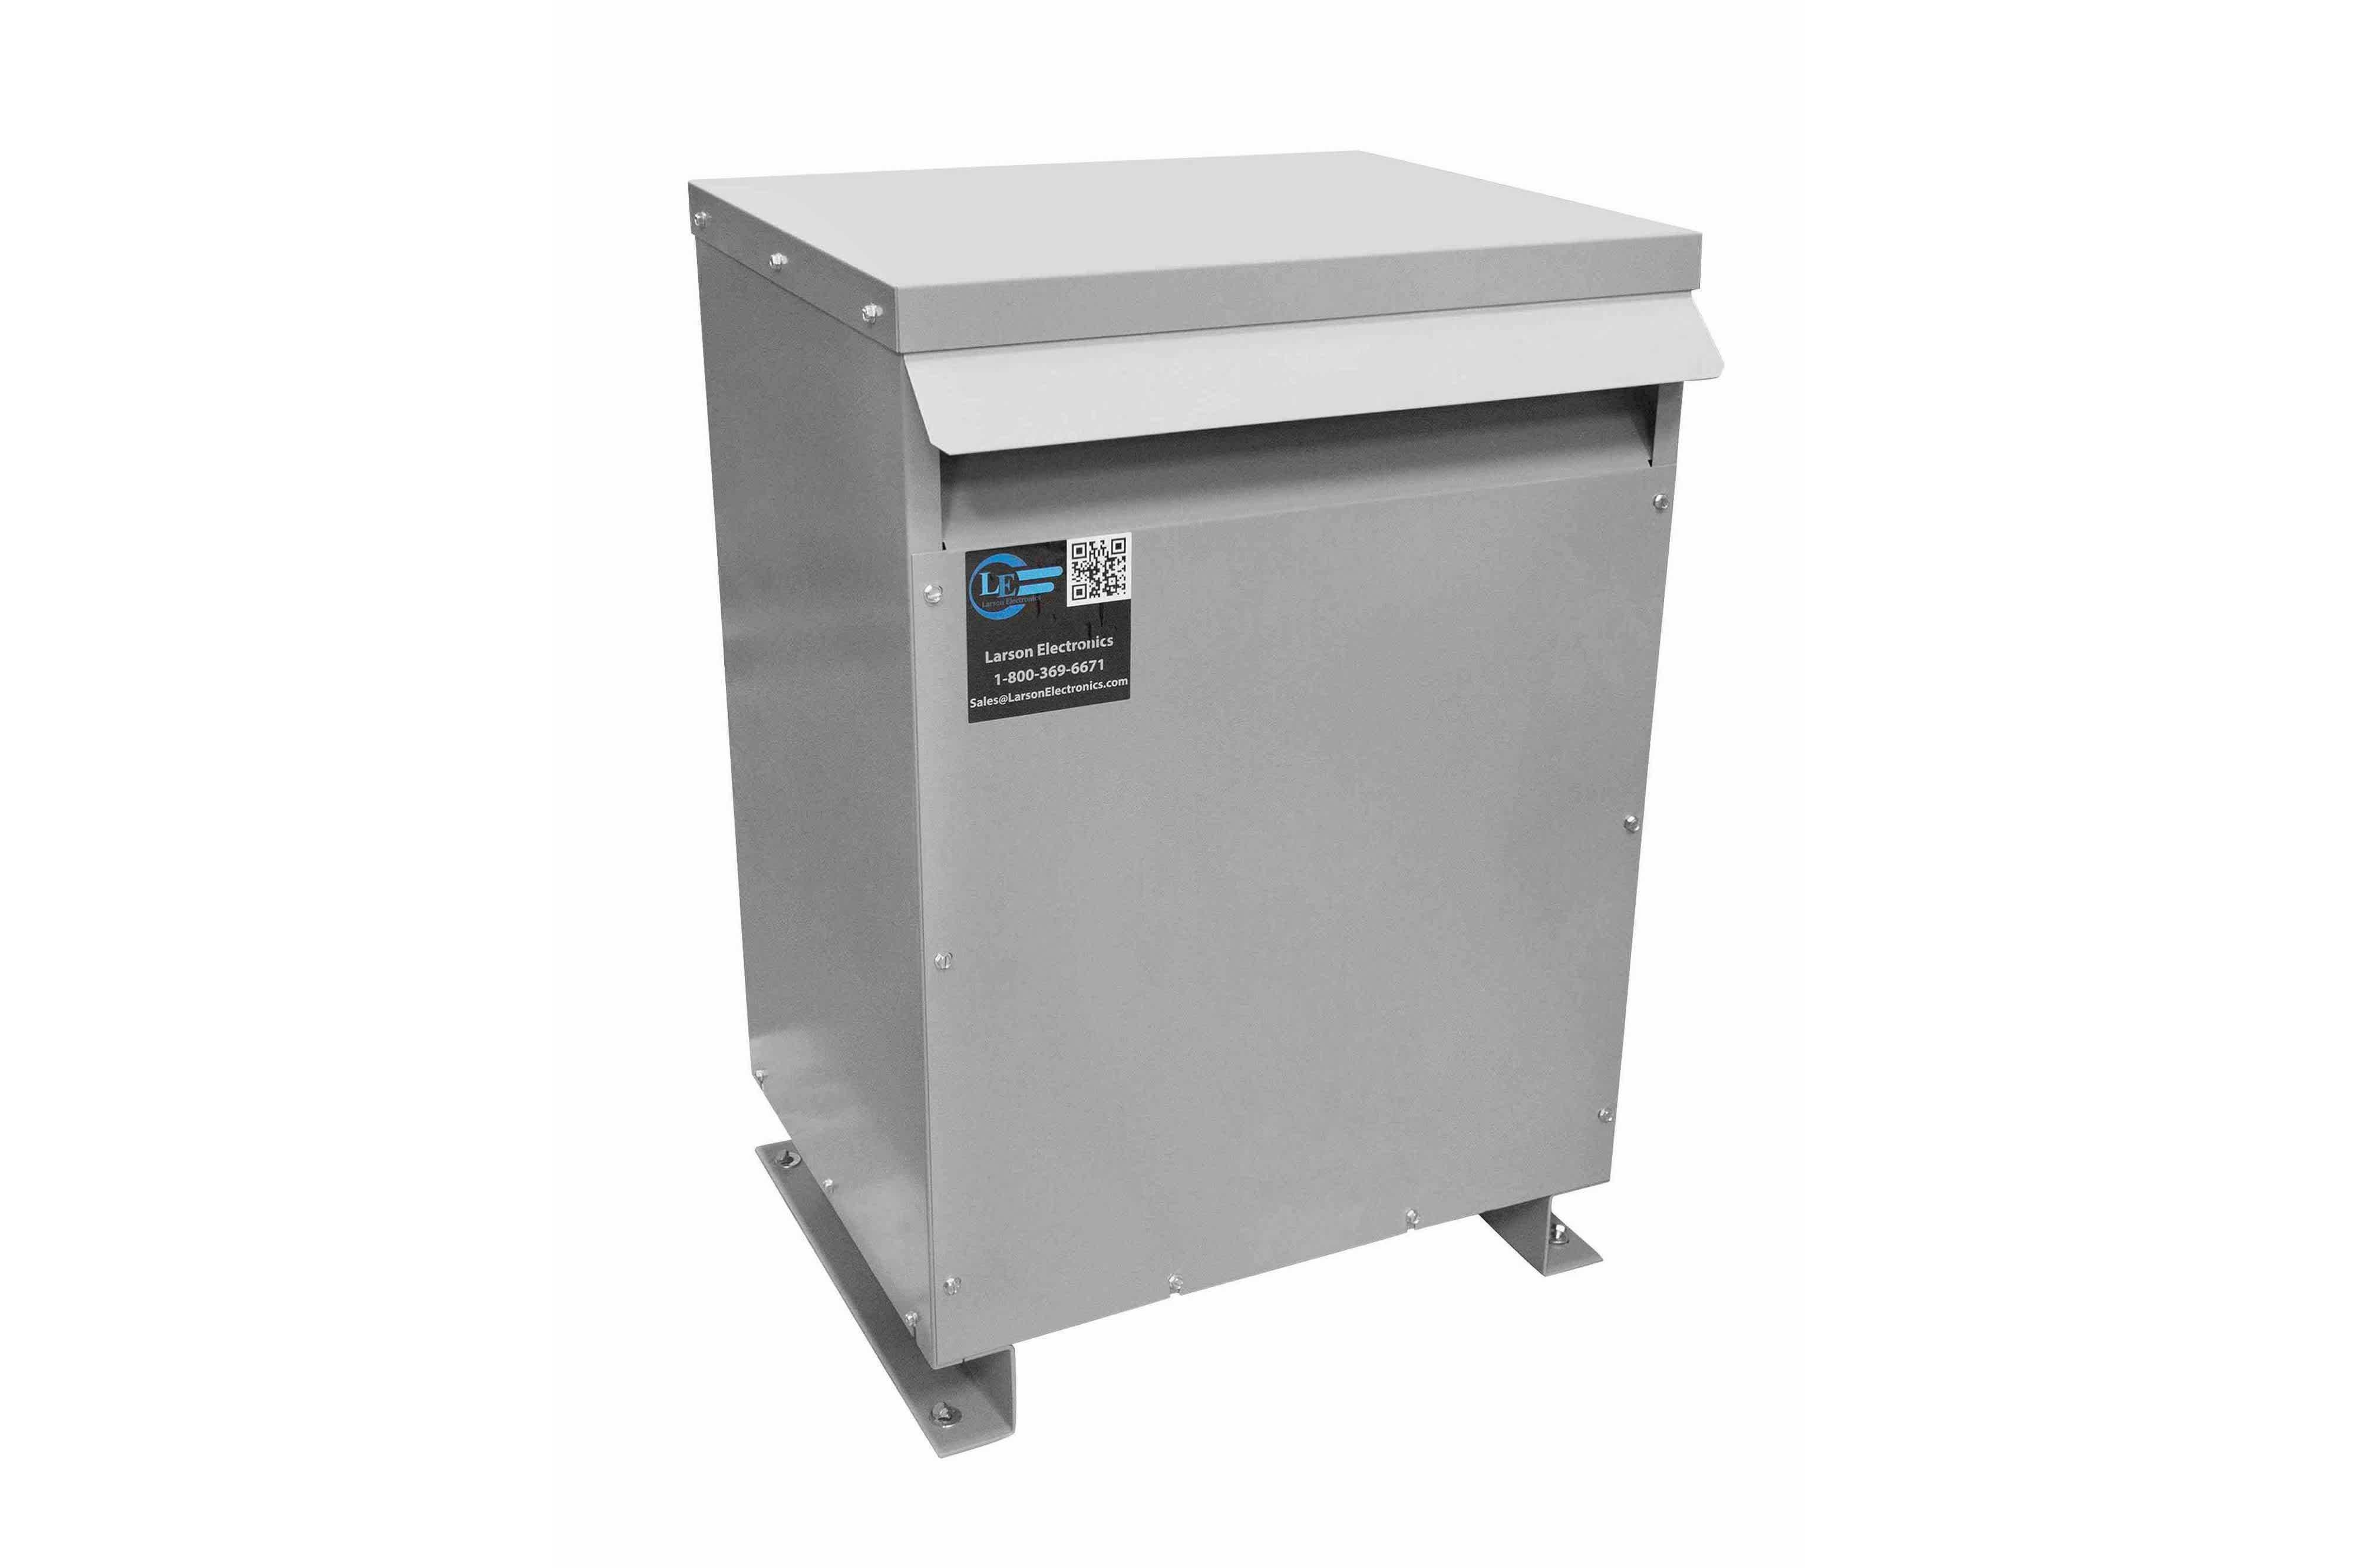 137.5 kVA 3PH Isolation Transformer, 400V Wye Primary, 240V/120 Delta Secondary, N3R, Ventilated, 60 Hz